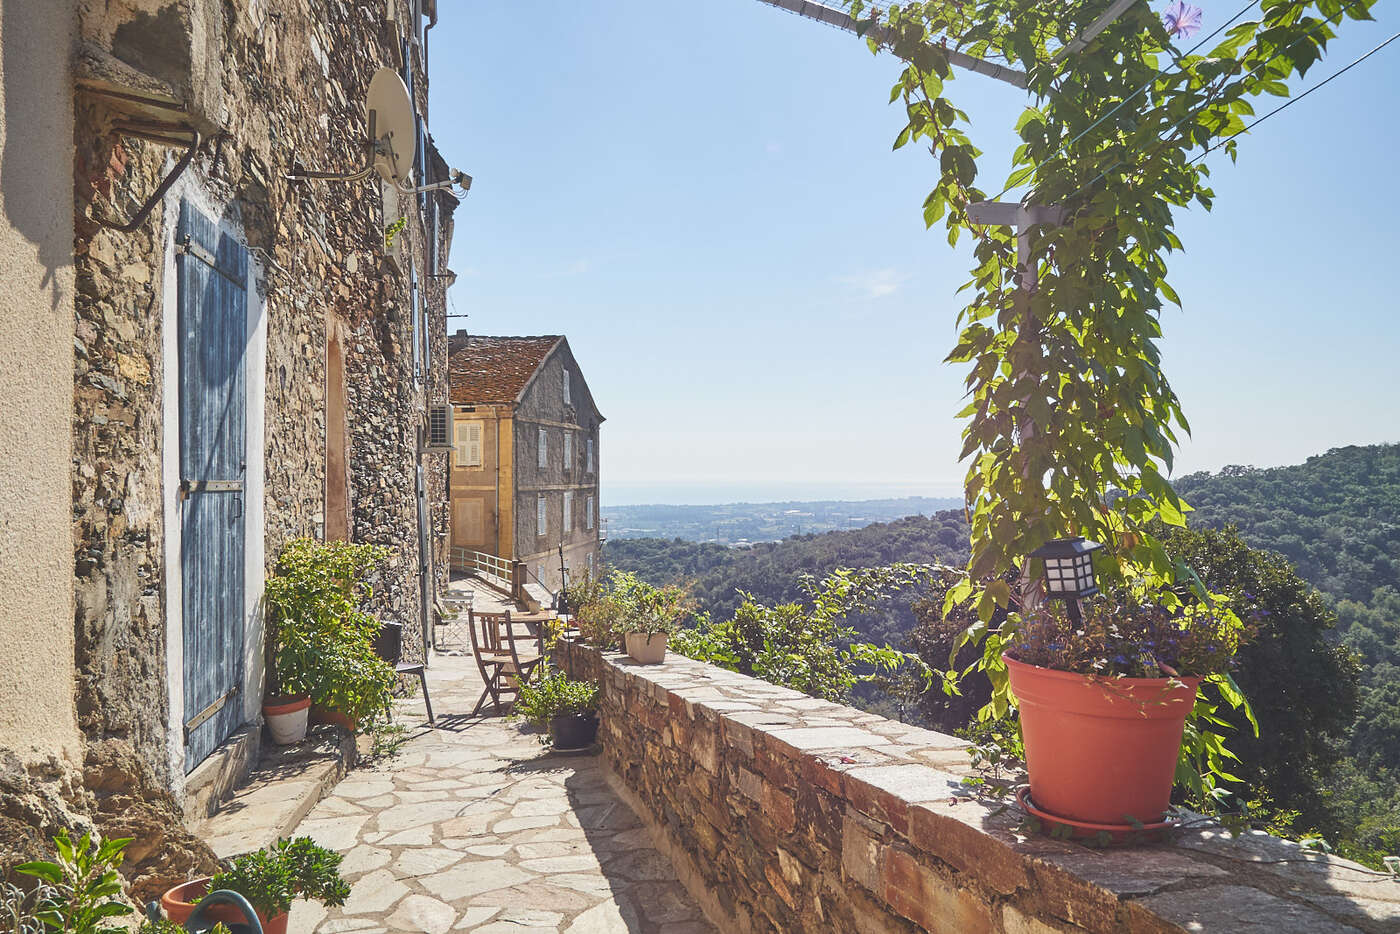 Ruelles de Castellare-di-Casinca, en Corse